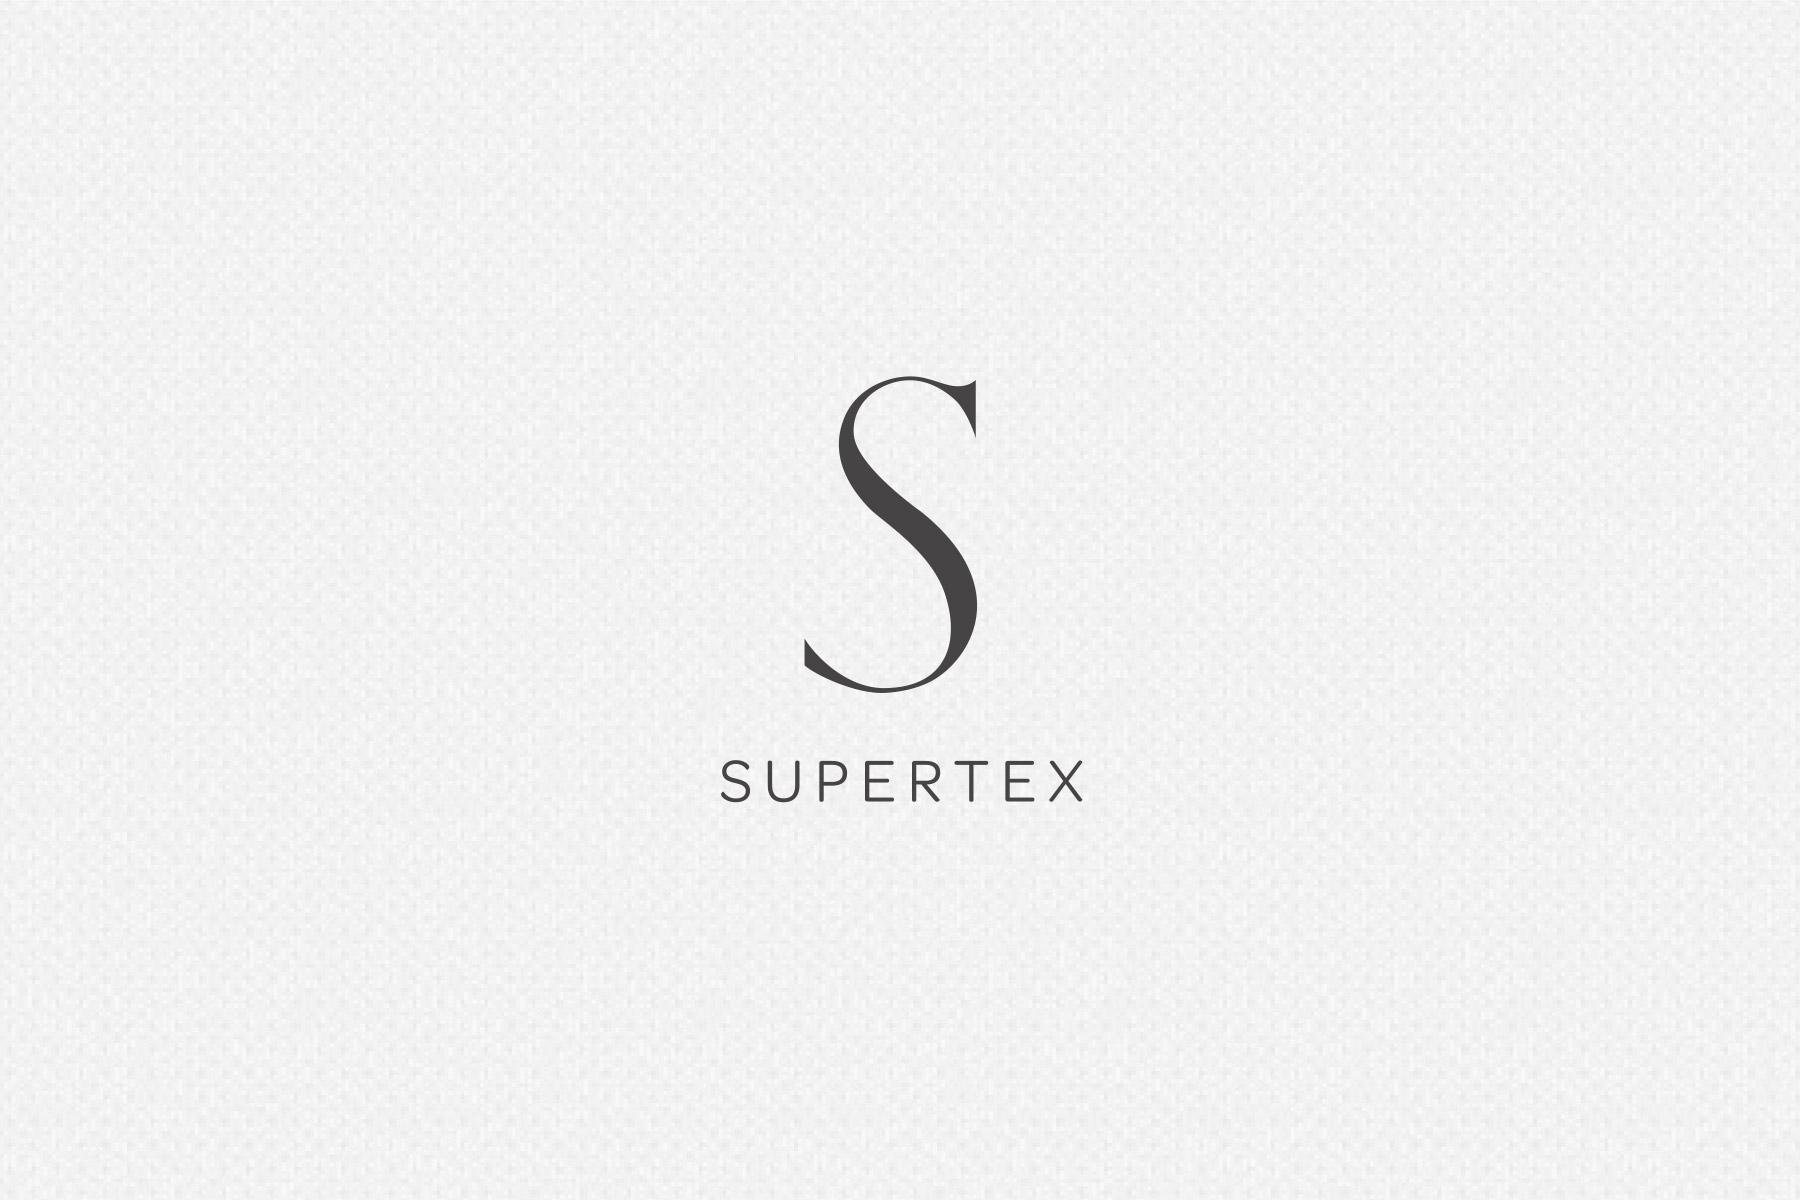 Supertex-Luxury-clothing-manufacturer-fashion-logo-design-by-Miss-Kathy-Ramirez.jpg